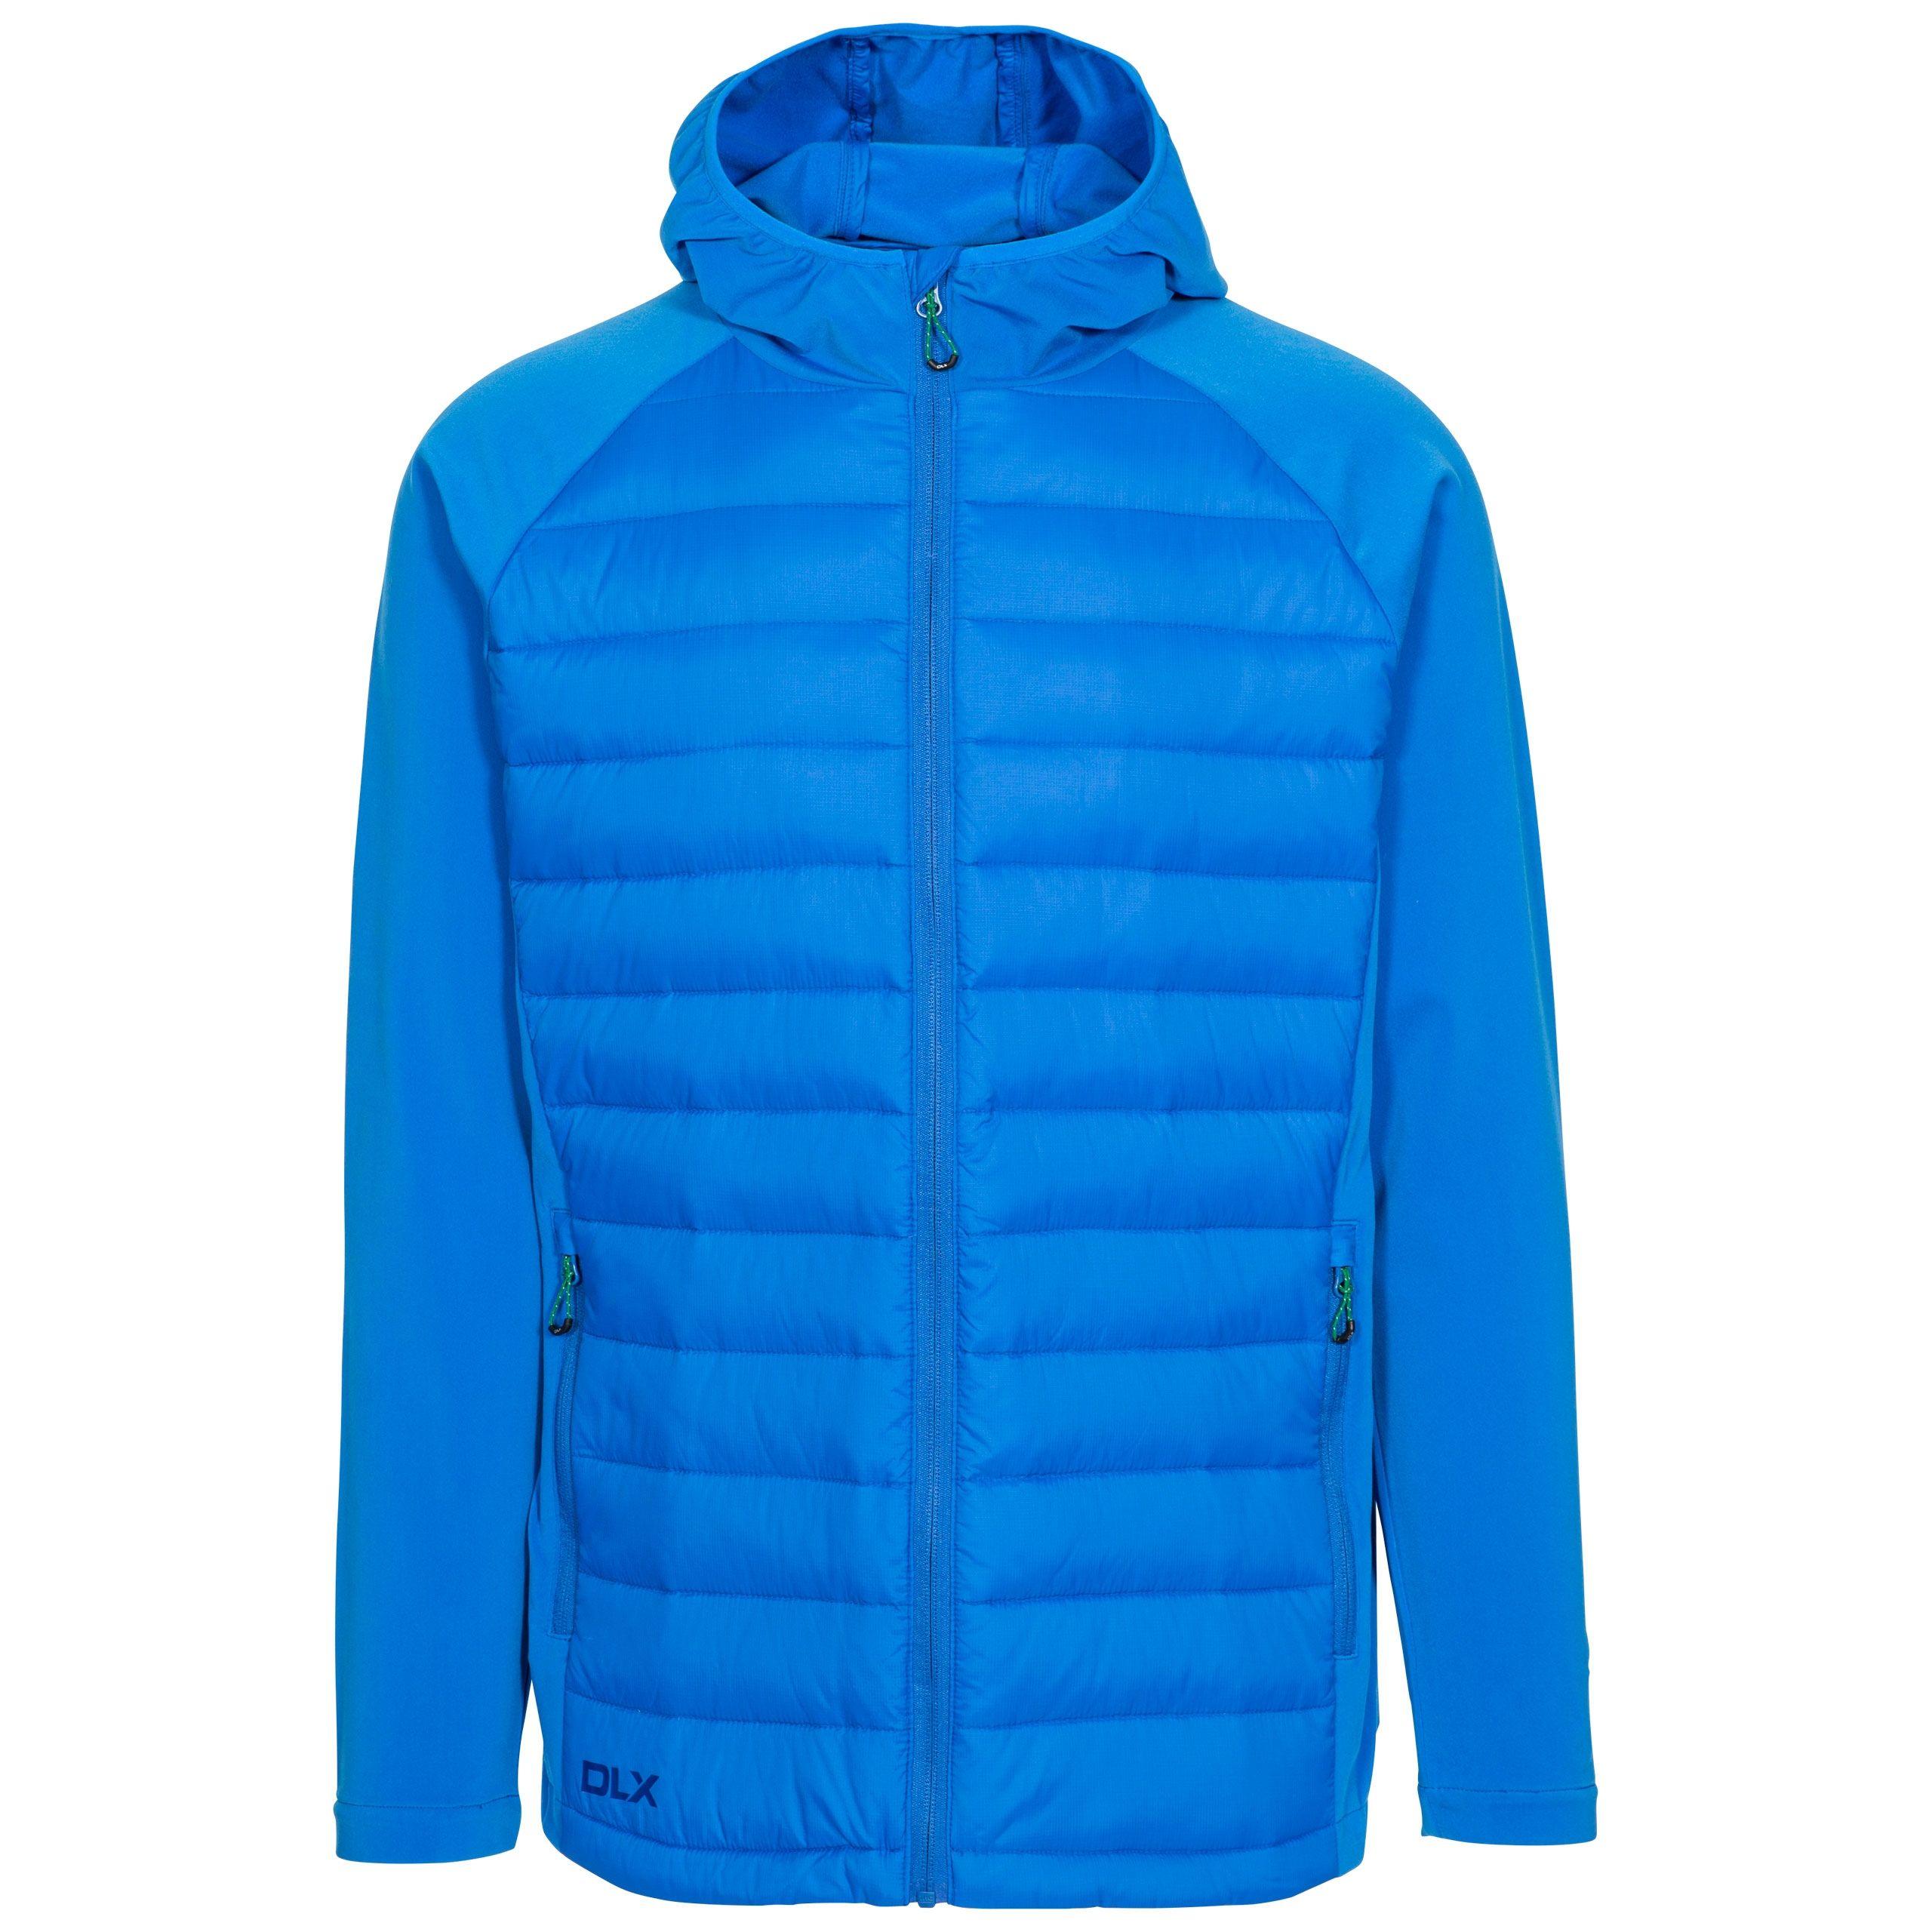 Condor Mens Waterproof Golf Jacket